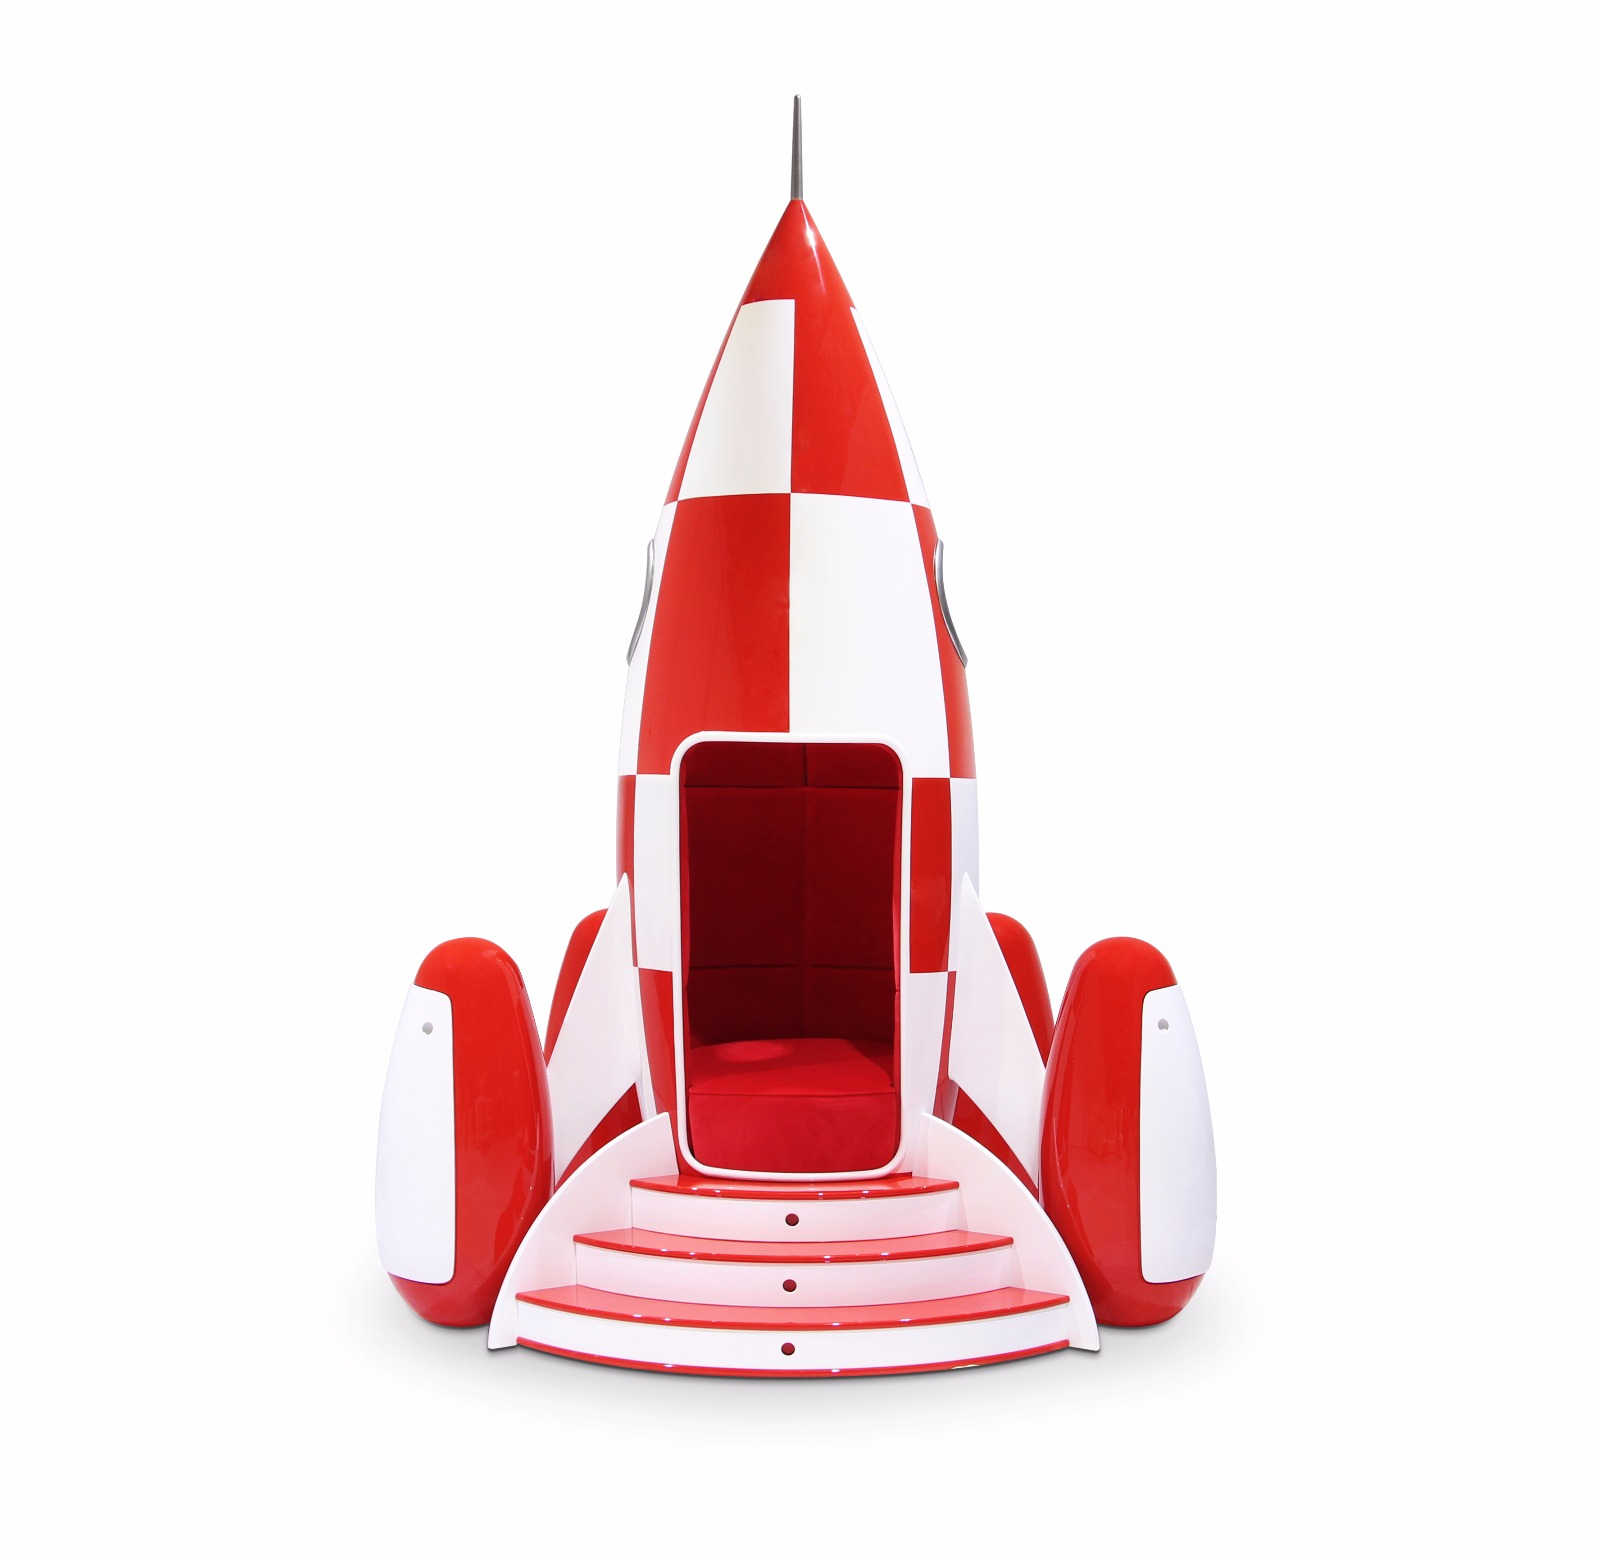 Design for Kids A Selection on Playful Furniture at Maison Objet 2016 (1) maison objet Design for Kids: A Selection on Playful Furniture at Maison Objet 2016 Design for Kids A Selection on Playful Furniture at Maison Objet 2016 1